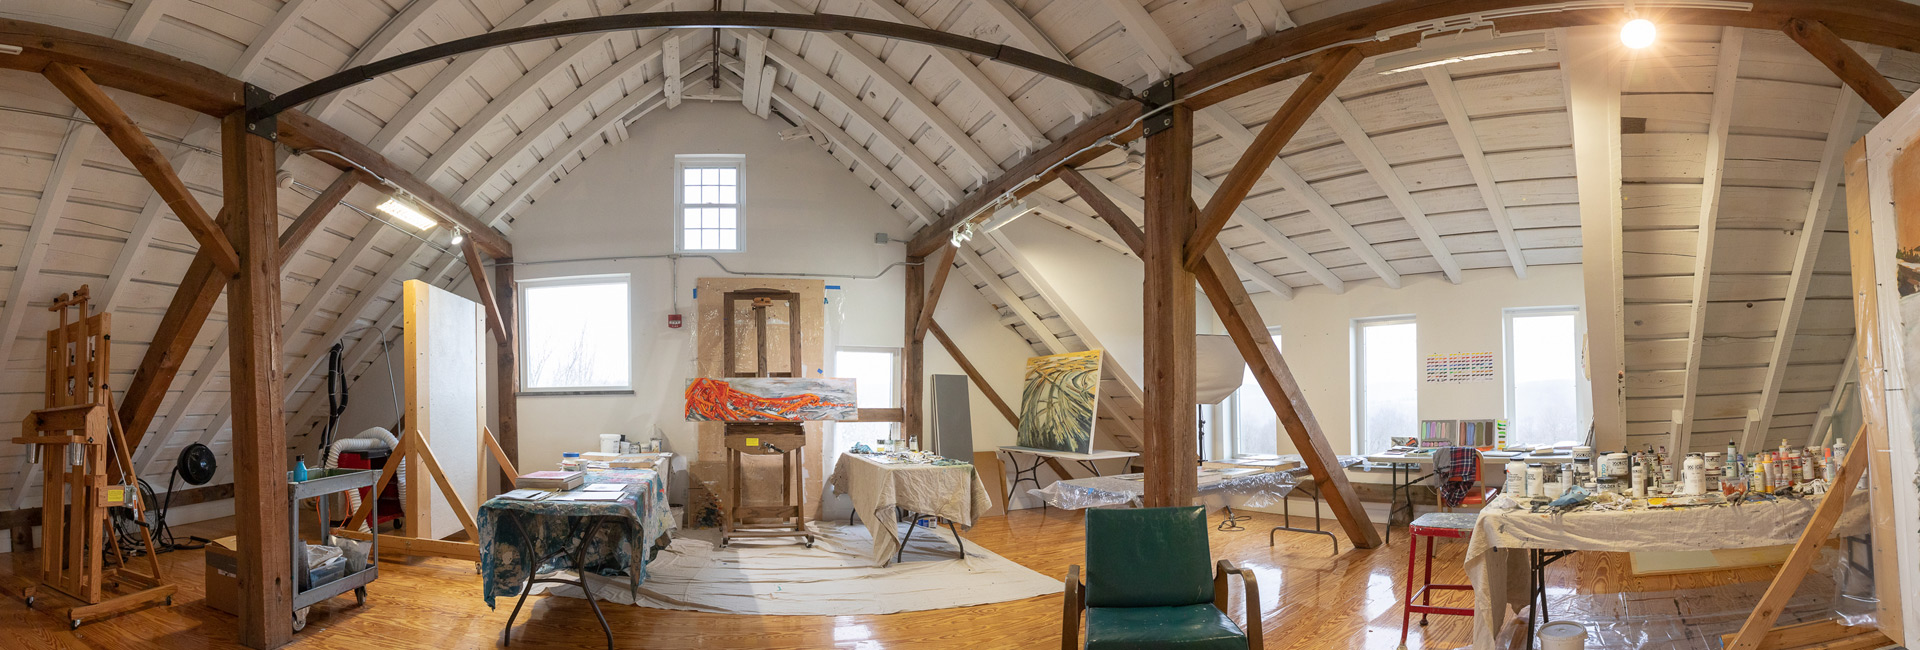 Studios at the Golden Foundation facilities, New Berlin, NY